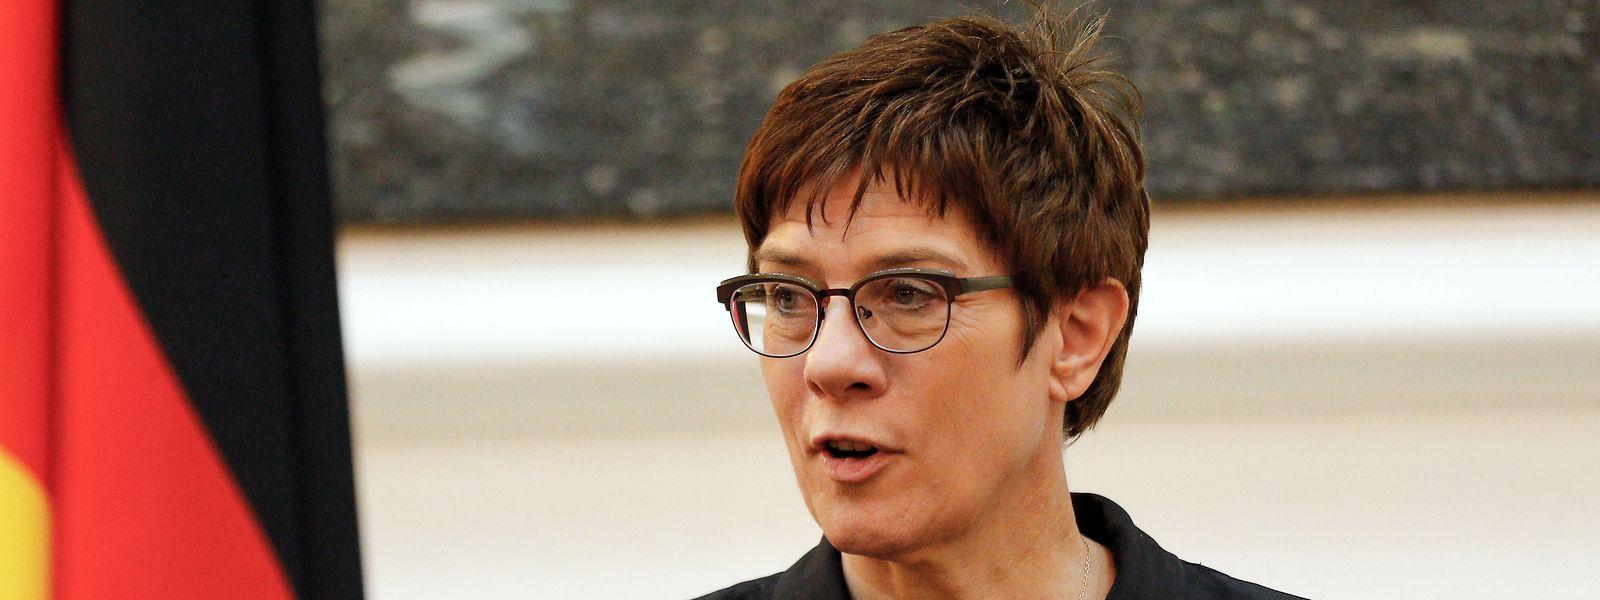 Annegret Kram-Karrenbauer, ministra da defesa alemã.